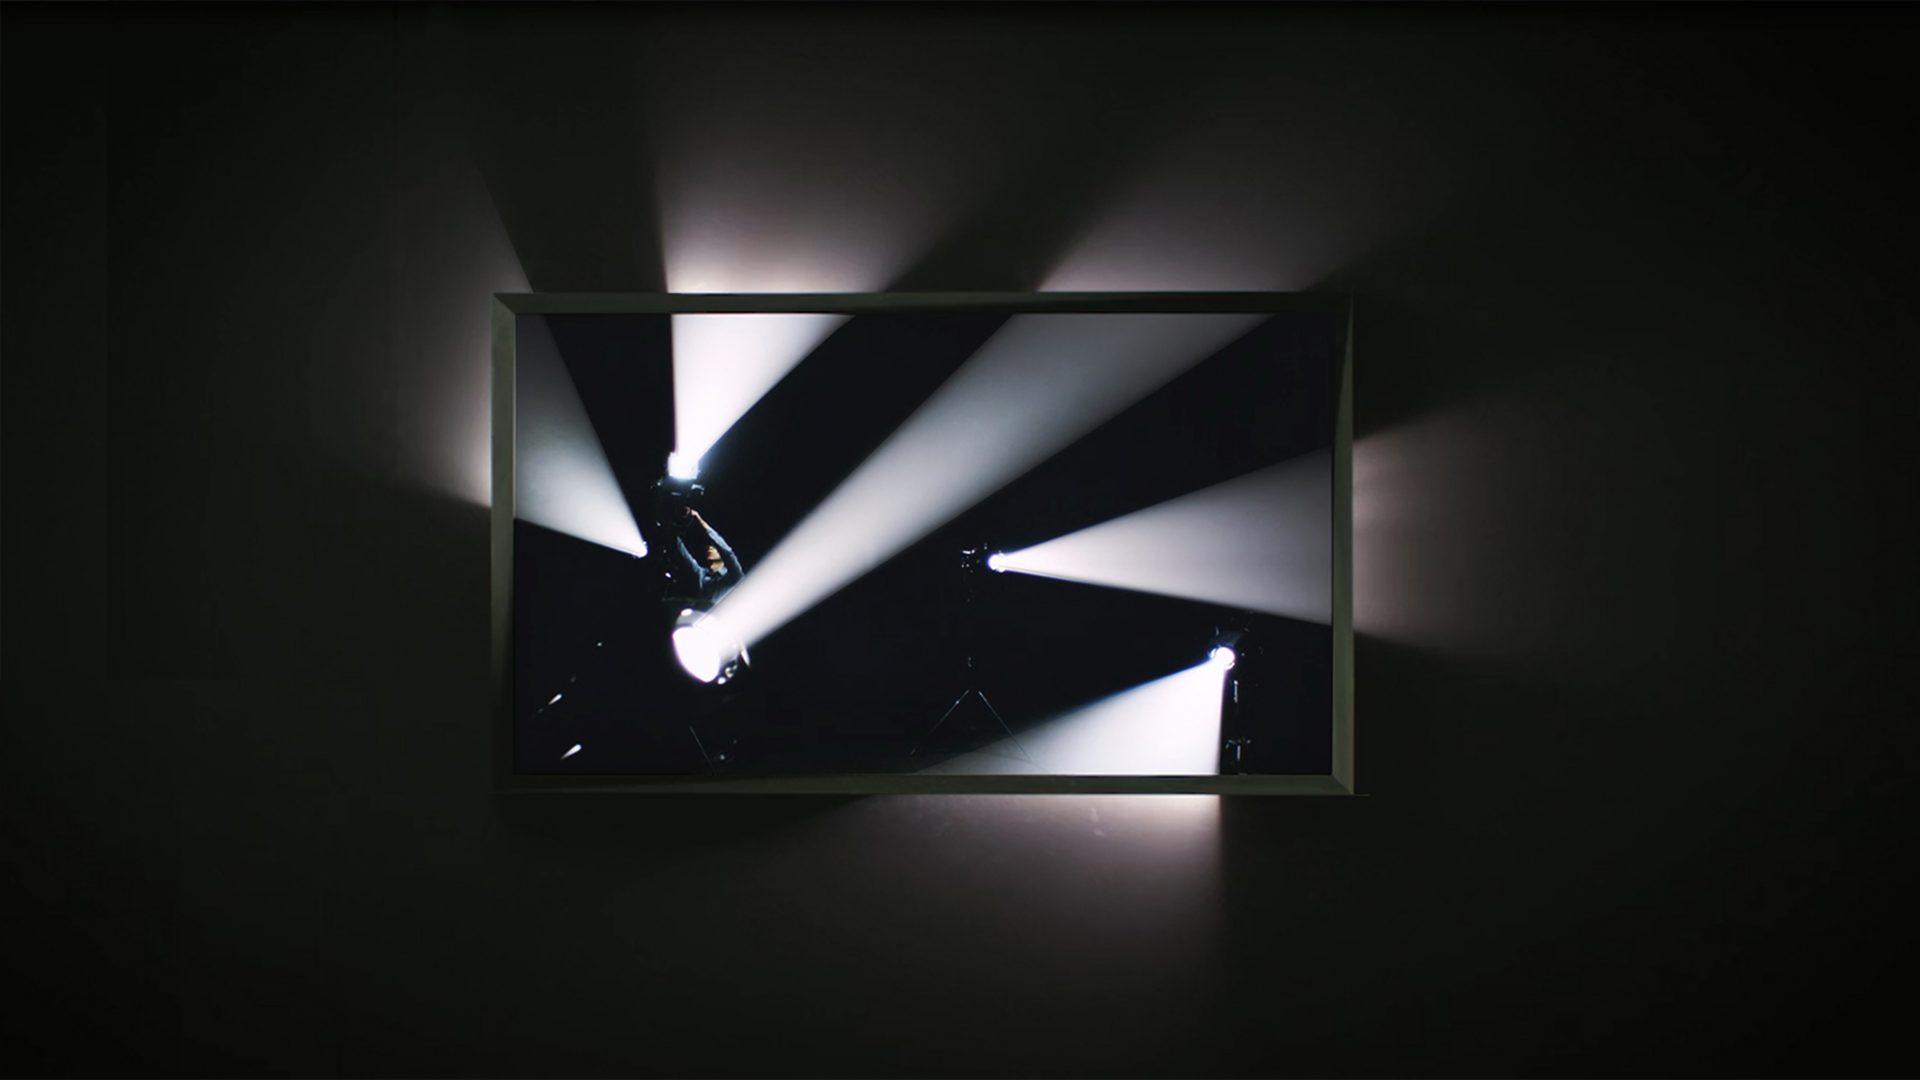 L'image éclaire - Light beams screen - Exhibition Panorama 17, Le Fresnoy - 2015/ Credits : RF Studio